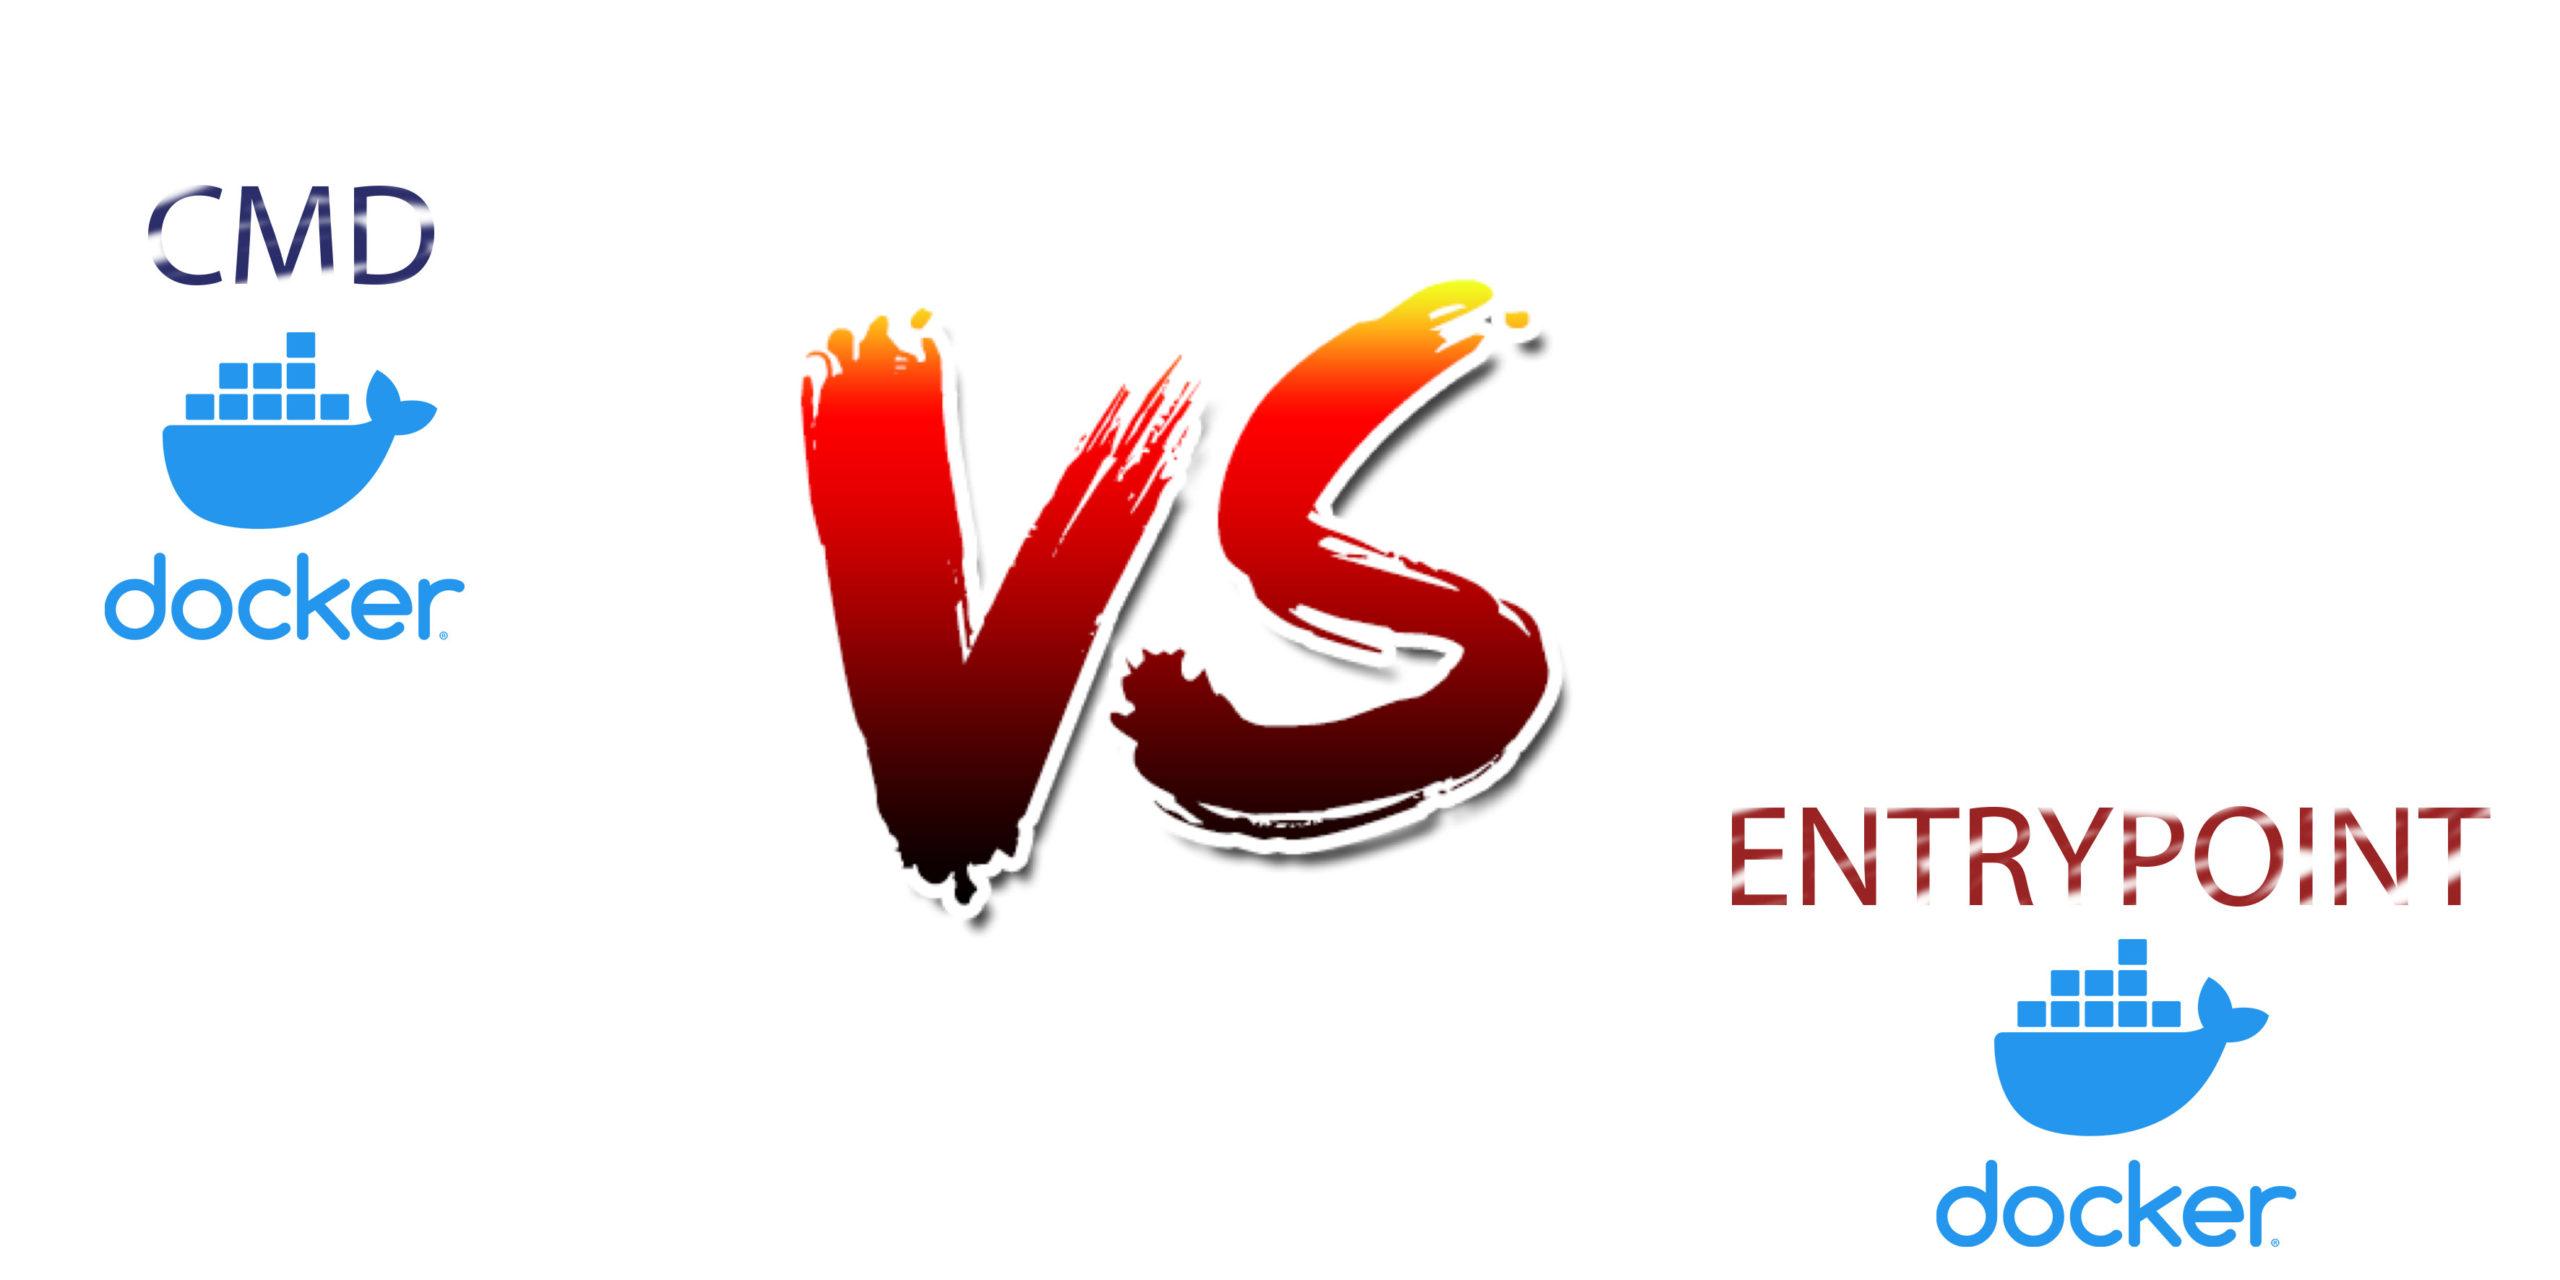 cmd vs entrypoint